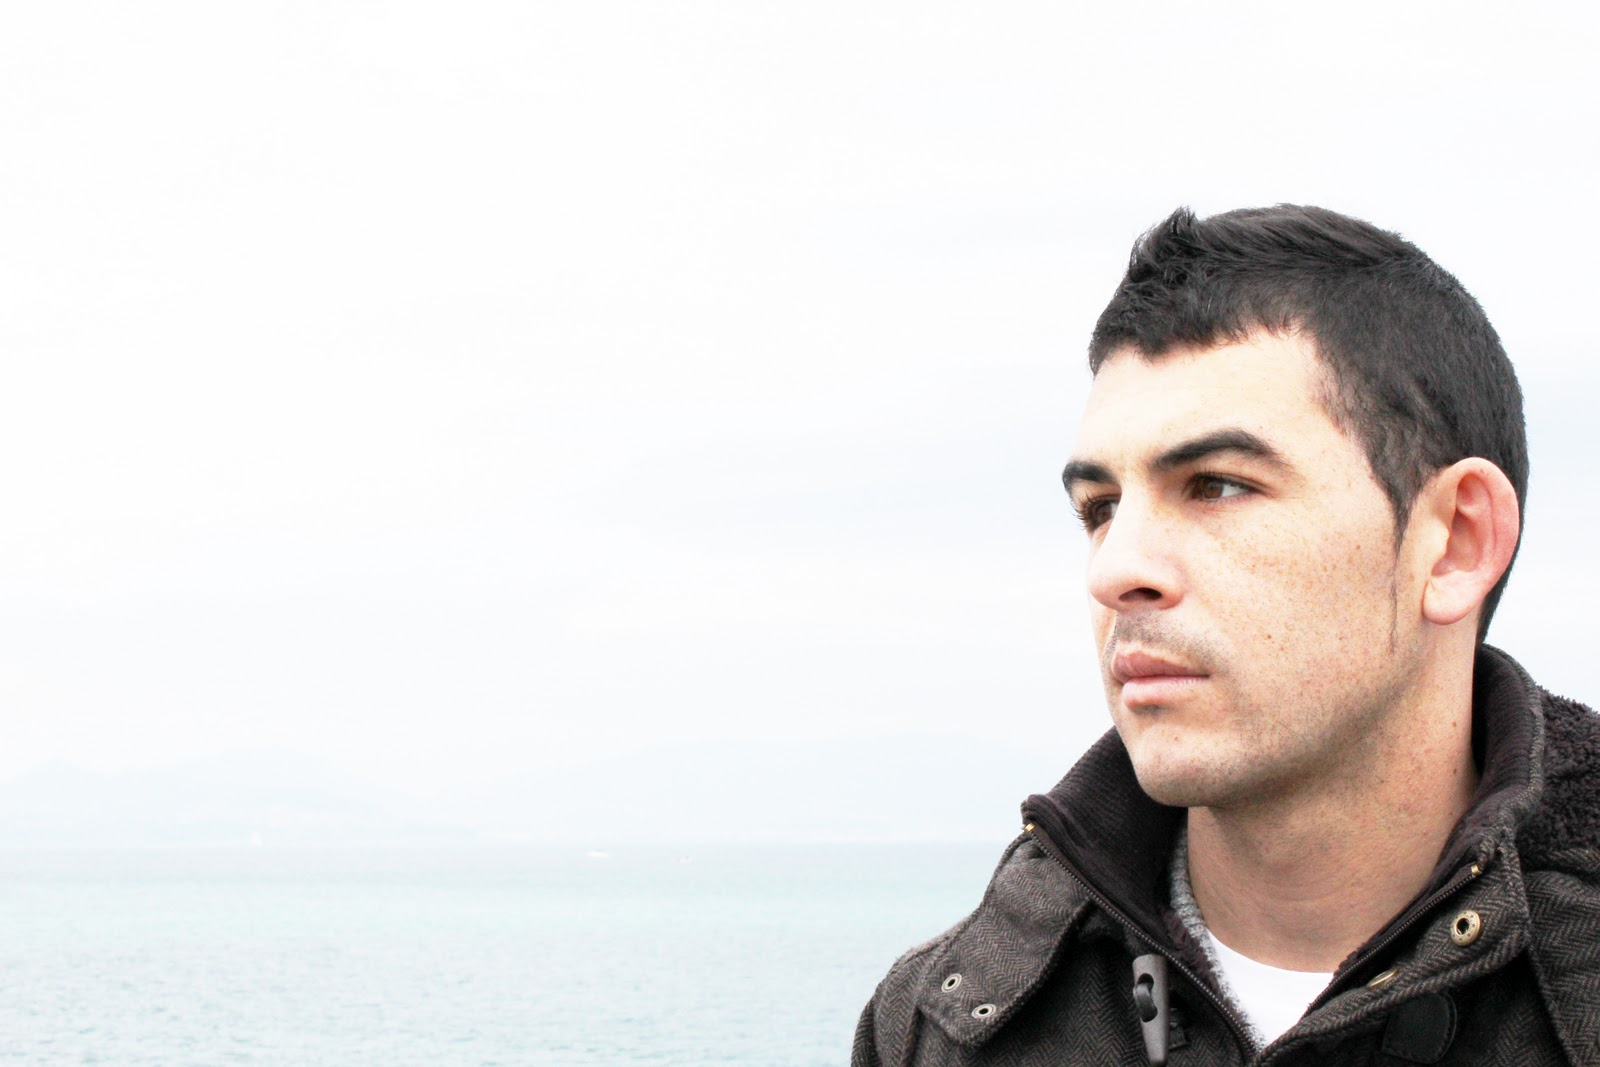 [HEMEROTECA] 2012: Entrevista a Dimension